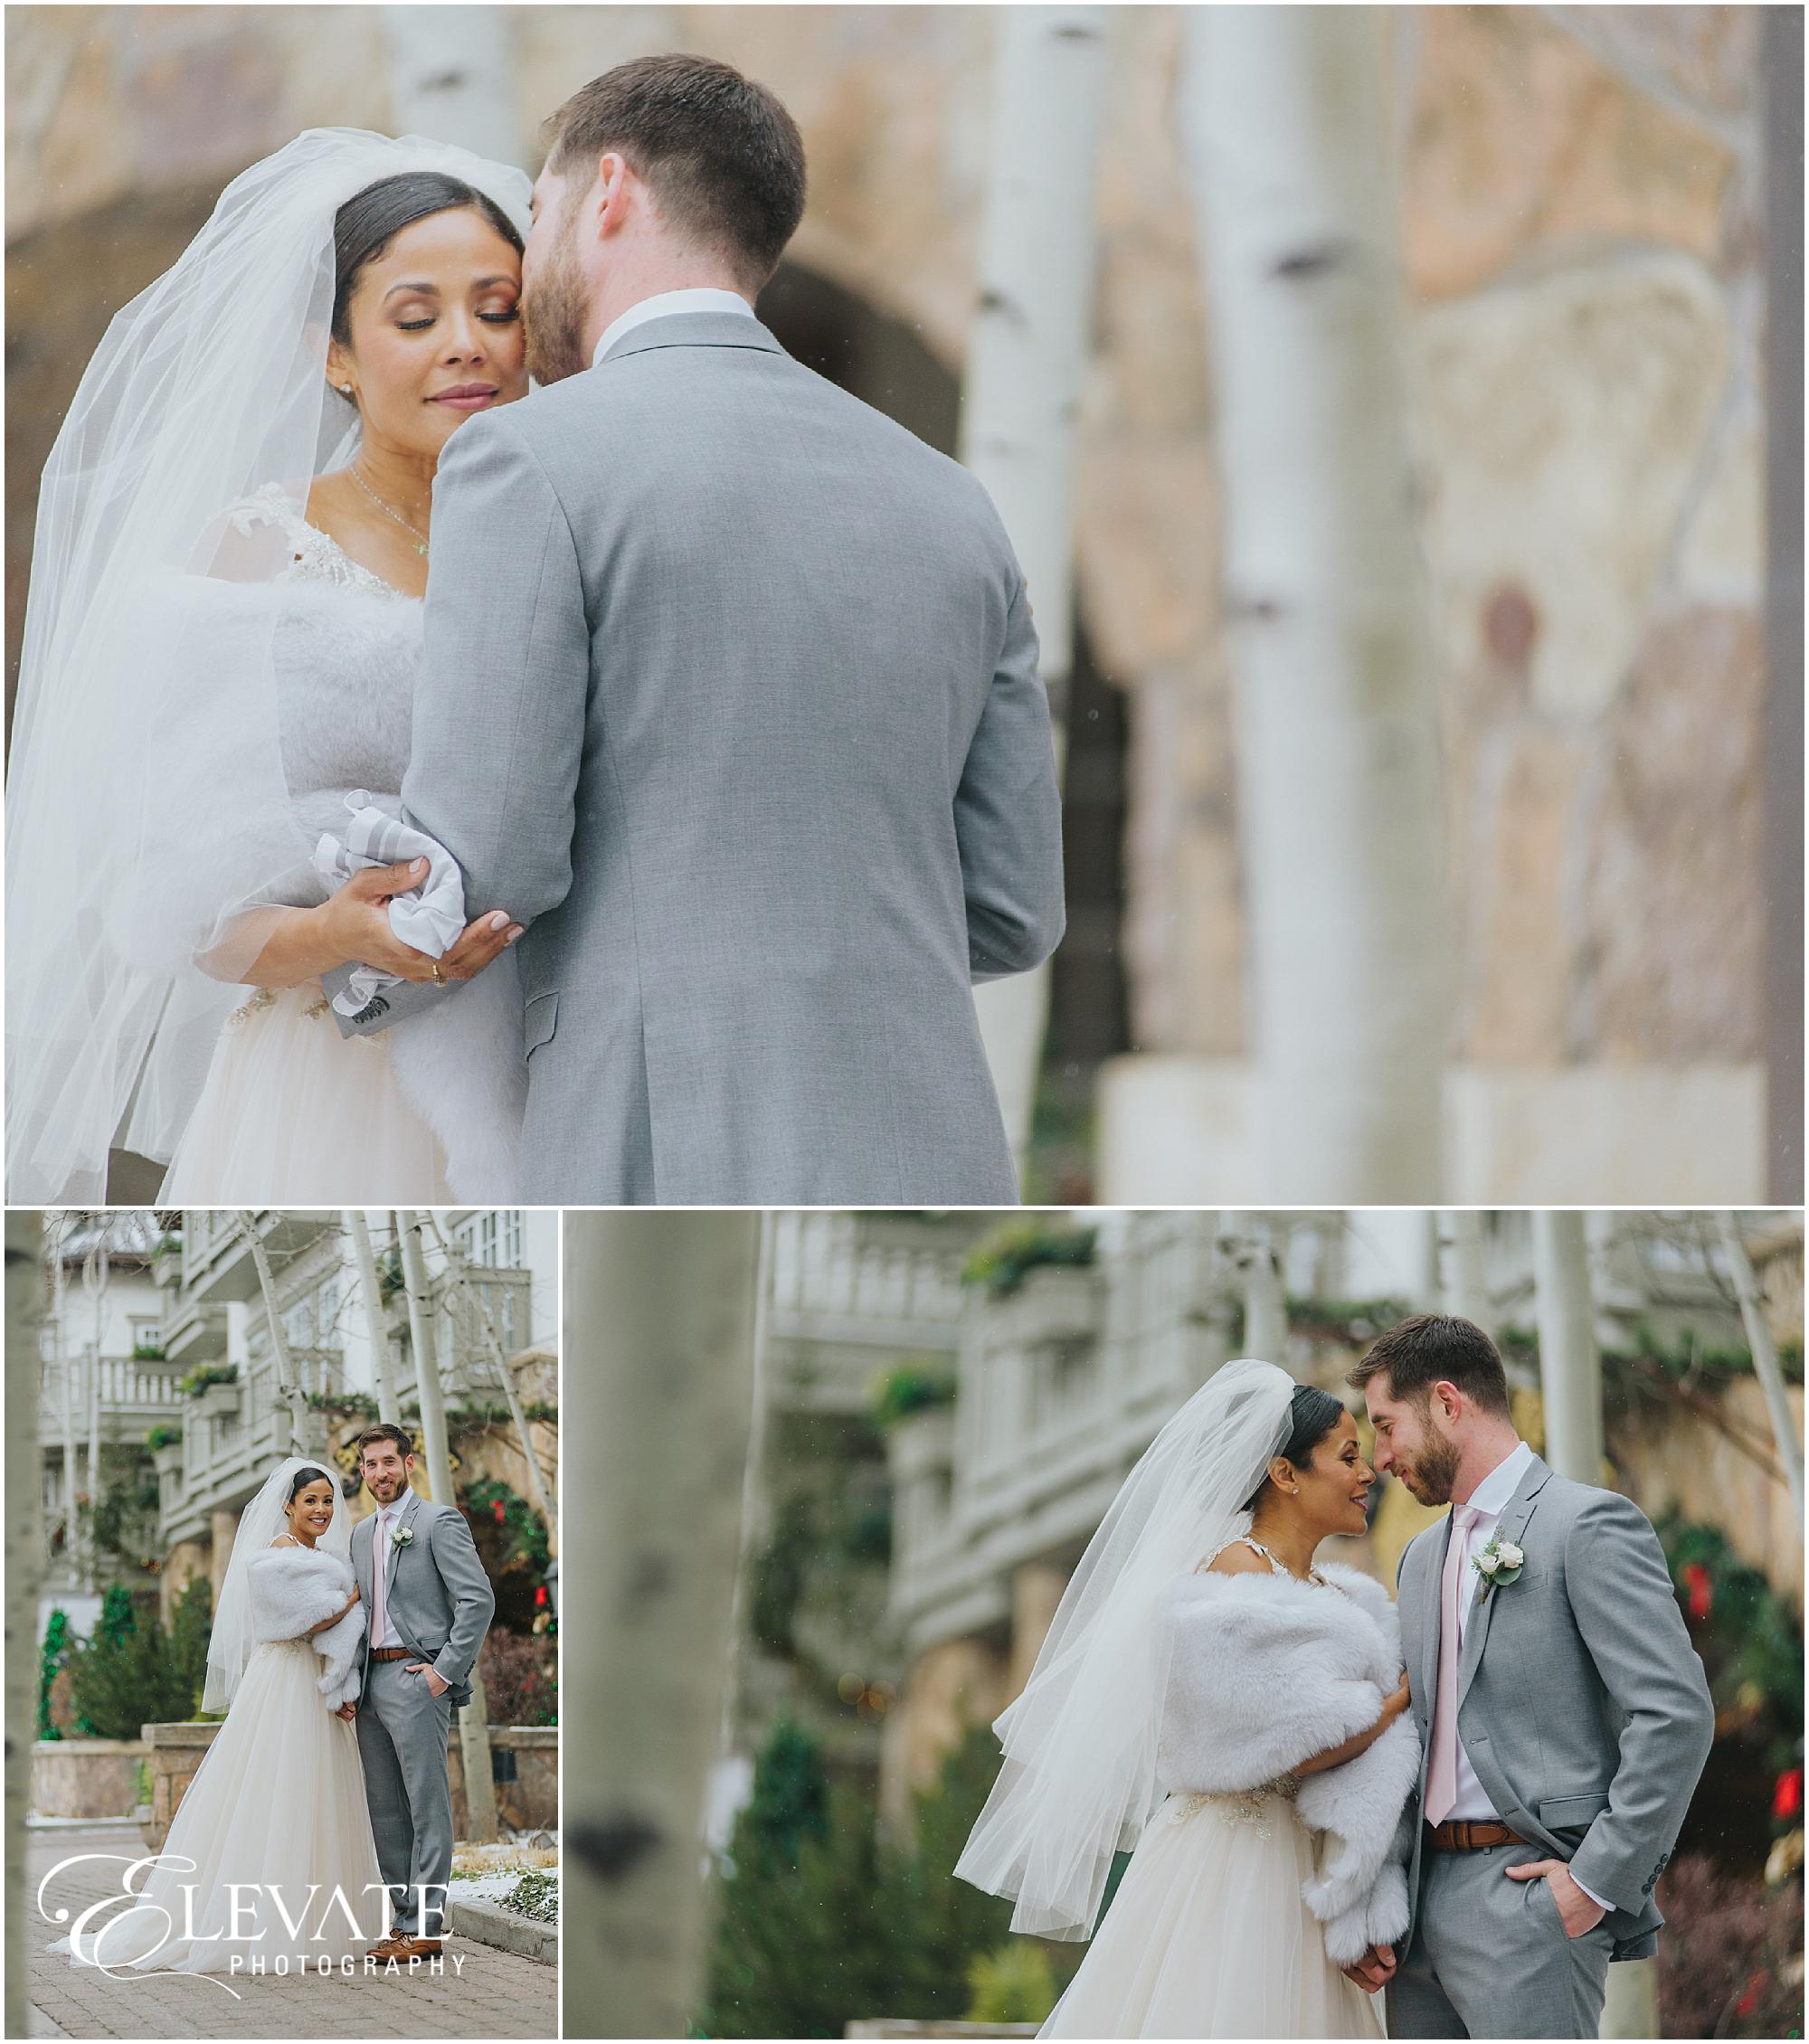 Zuleika + Jeb | Sonnenalp Winter Wedding Photos - Denver Wedding ...